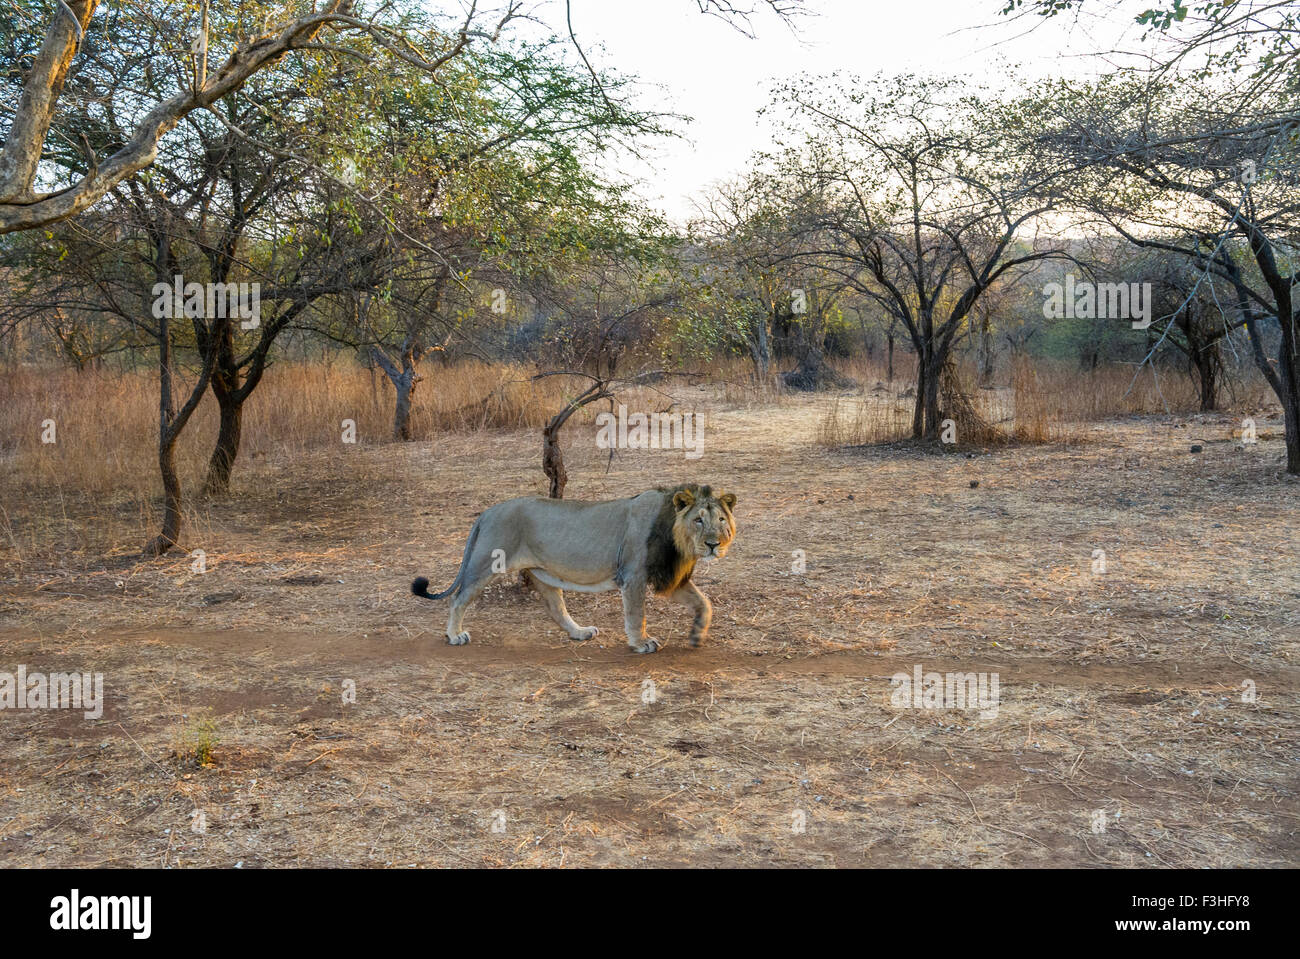 Asiatic Lion in his habitat (Panthera leo persica) at Gir forest, Gujarat, India. - Stock Image